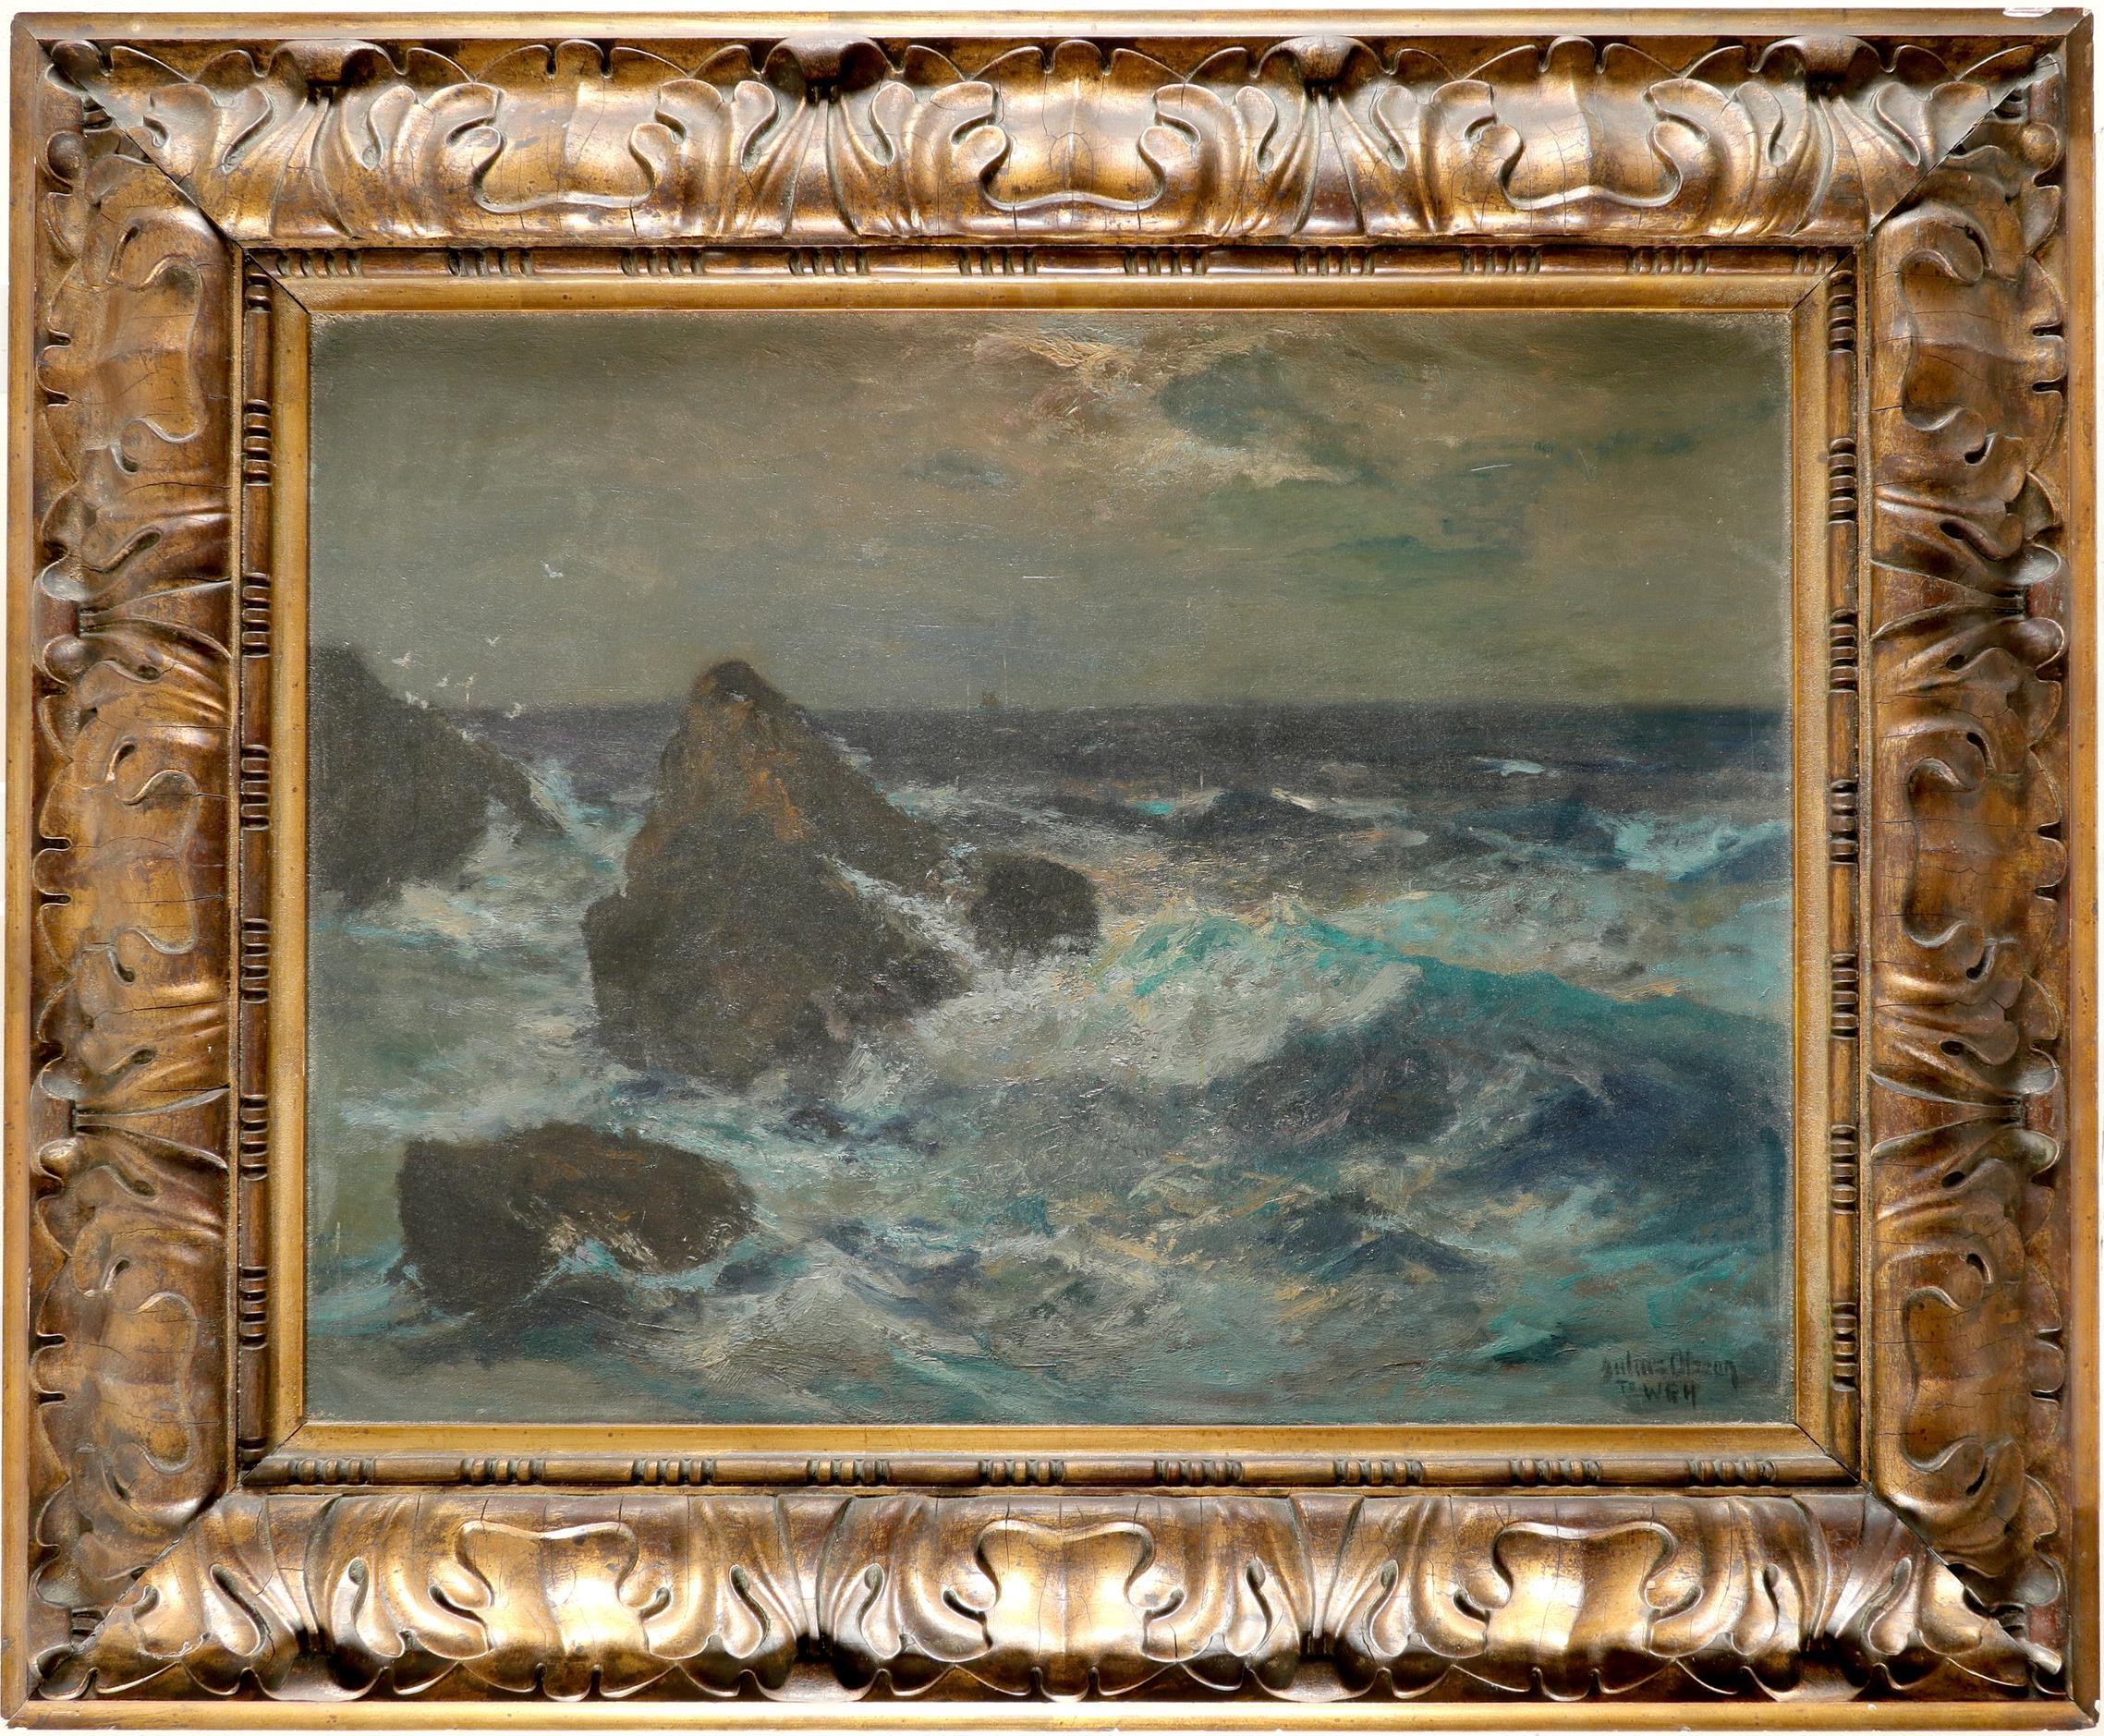 Julius Olsson RA (1864-1942) Waves crashing against the rocks Signed and inscribed Julius Olsson/ - Image 2 of 3